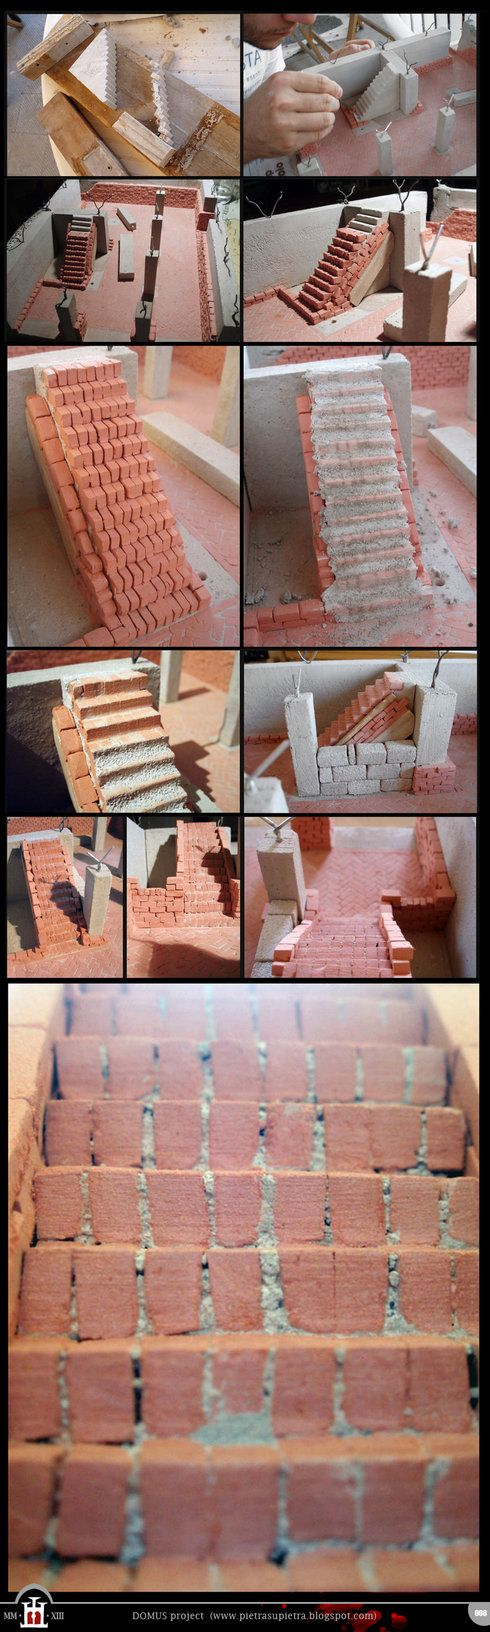 http://wernerio.deviantart.com/art/Domus-project-8-Brick-staircase-part-I-419311838